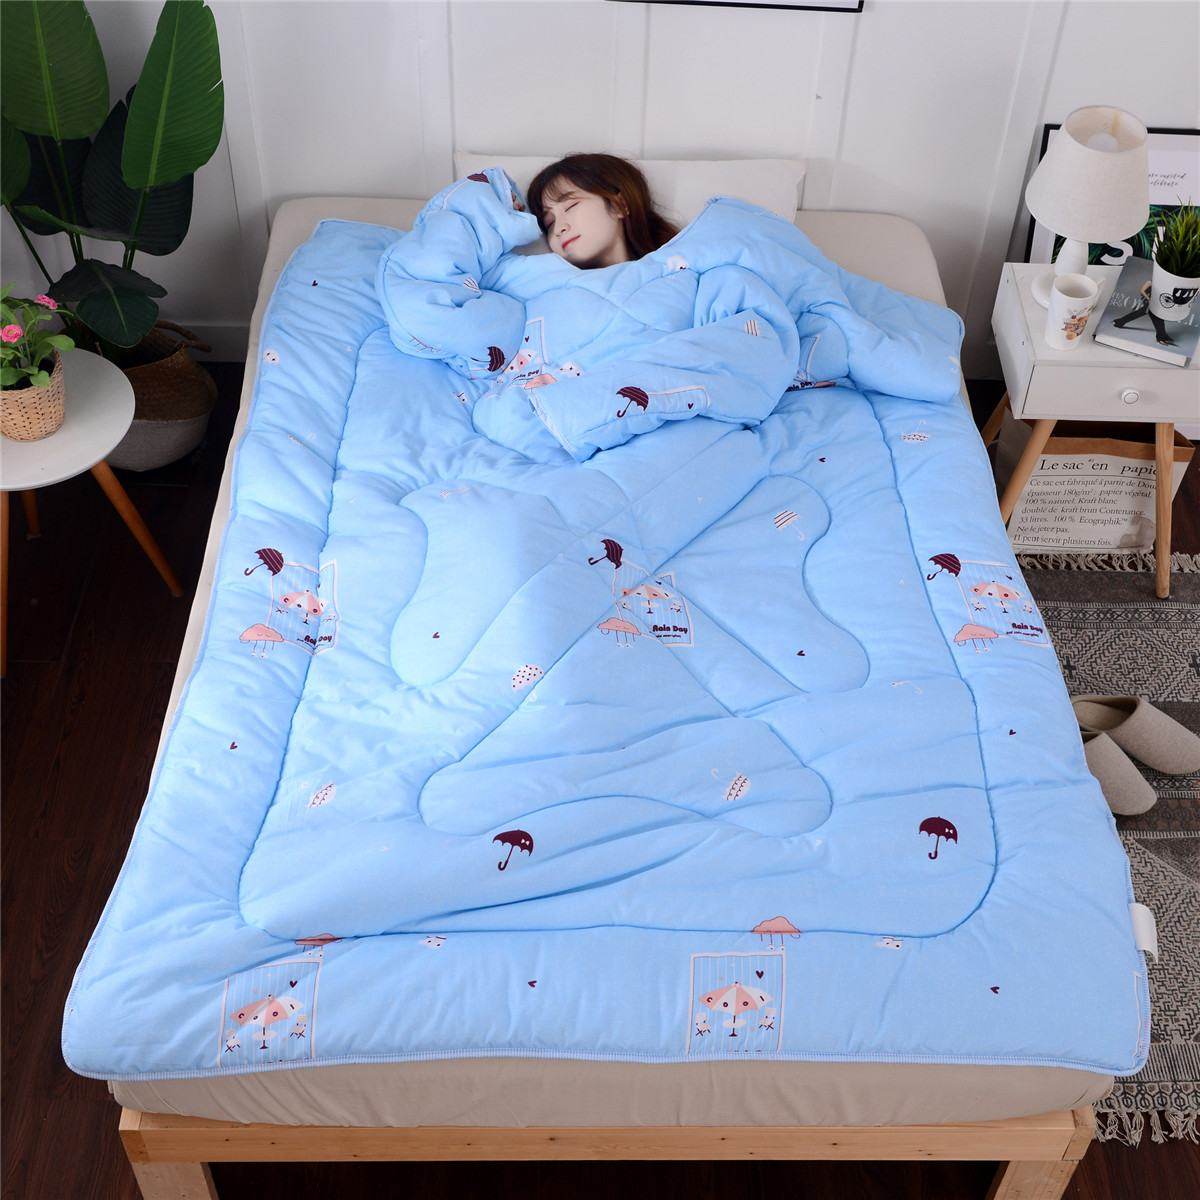 1,2 kg invierno edredones otoño colcha para perezosos con mangas cálido grueso manta edredón de lavado manta de siesta mantas 120cm x 160cm